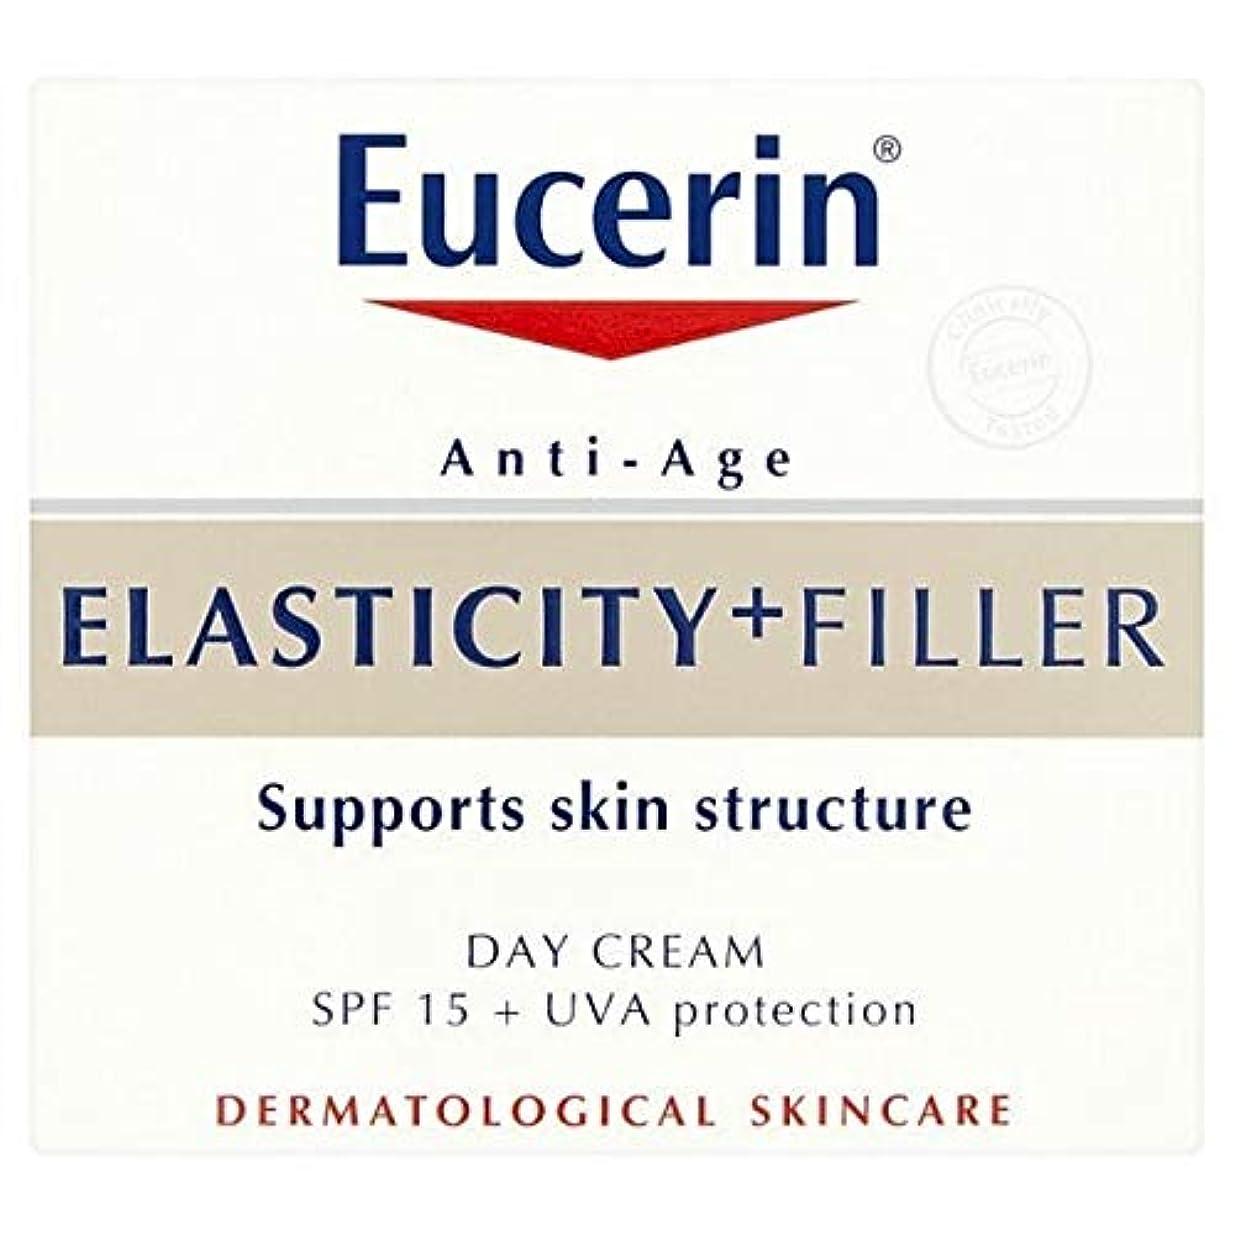 [Eucerin ] ユーセリン抗加齢弾力+フィラーデイクリーム50Ml - Eucerin Anti-Age Elasticity + Filler Day Cream 50ml [並行輸入品]